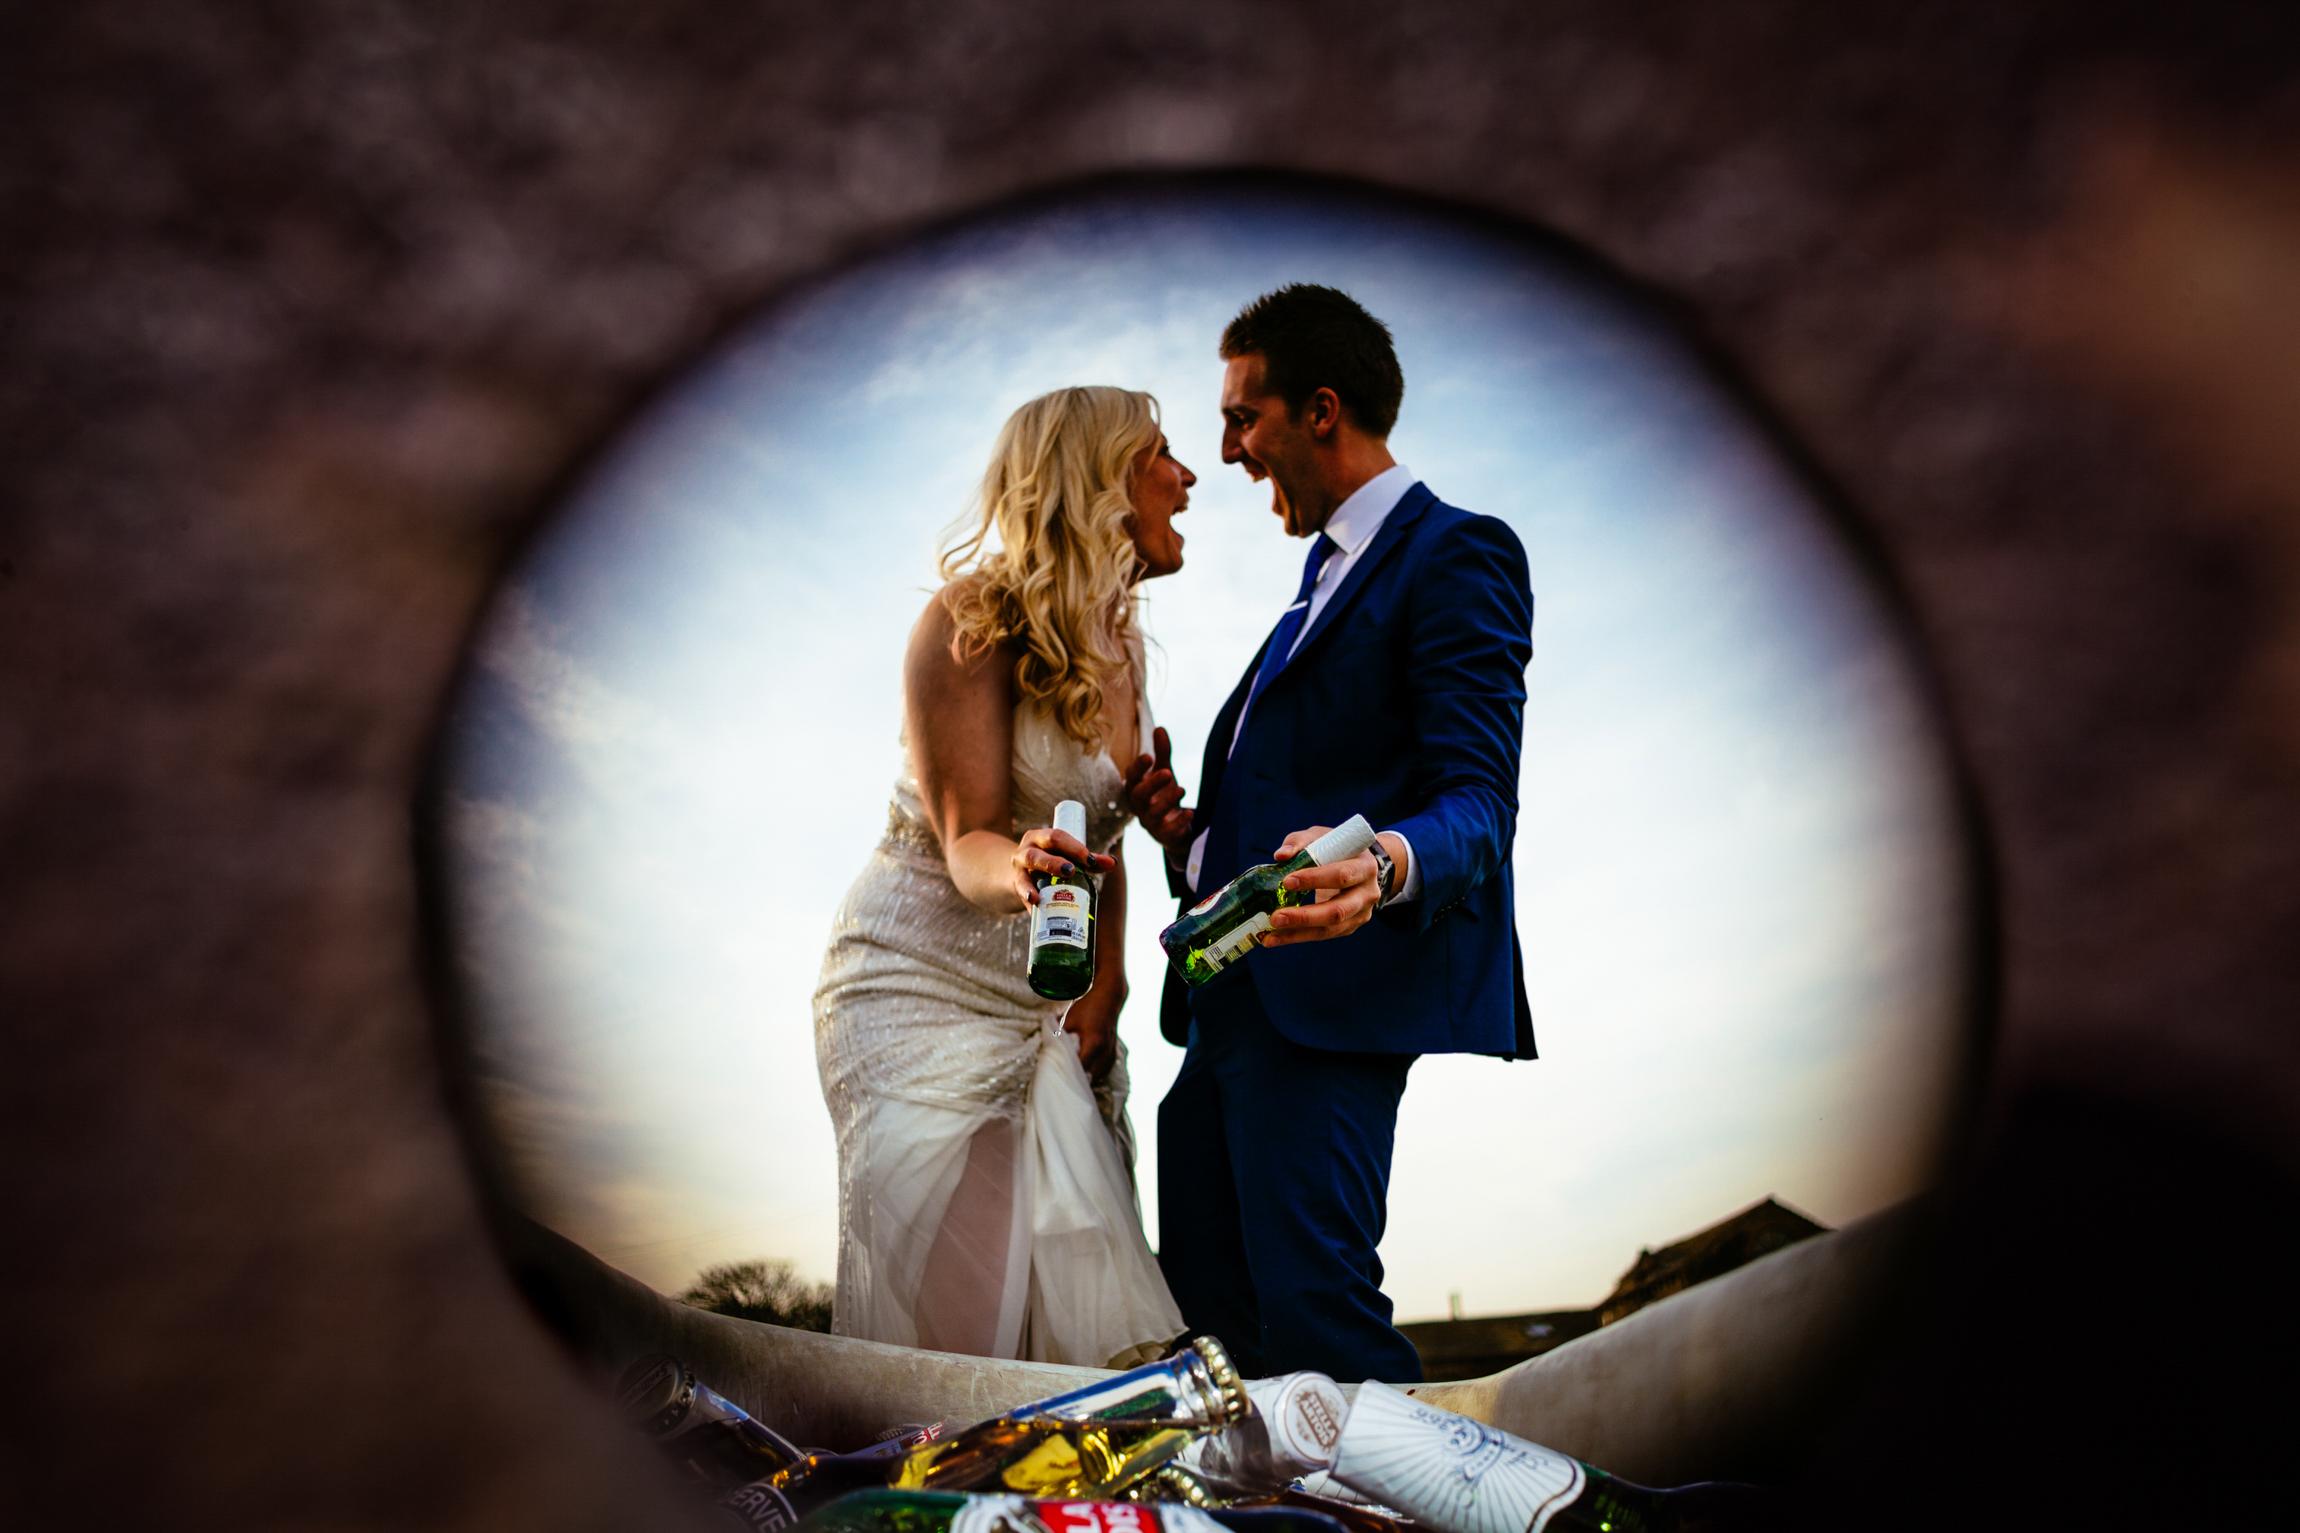 sansom photography rangefinder rising stars 2015-12